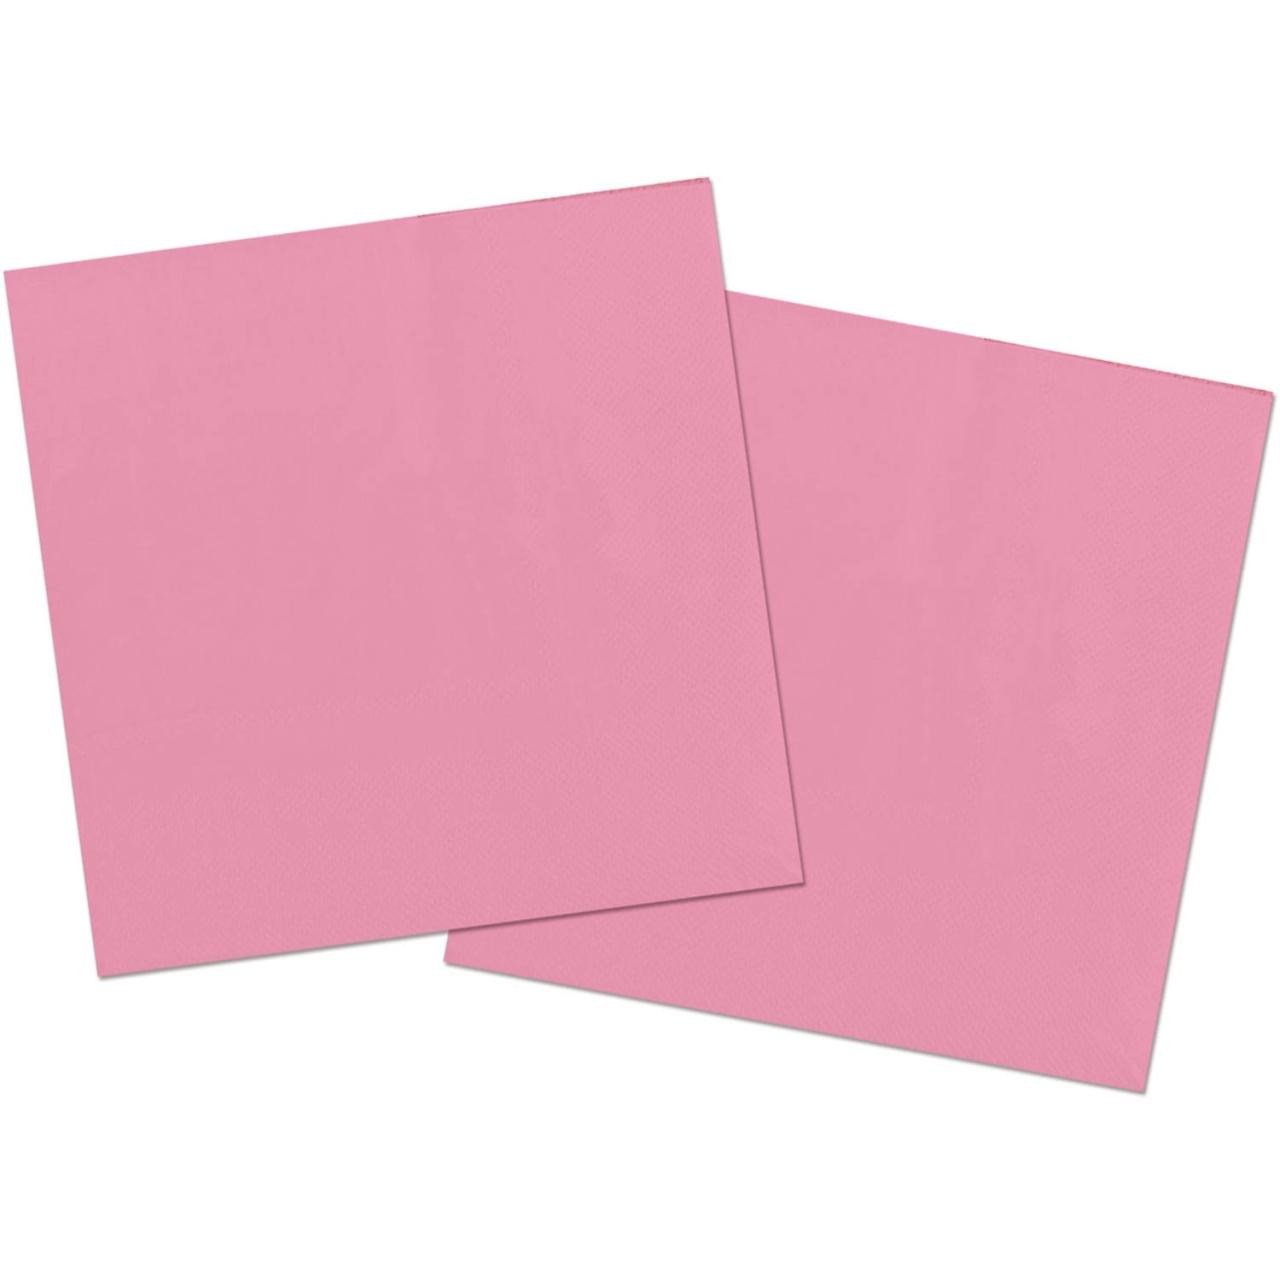 Servietten rosa 3 lagig ca 33x33 cm 20Stück im Pack